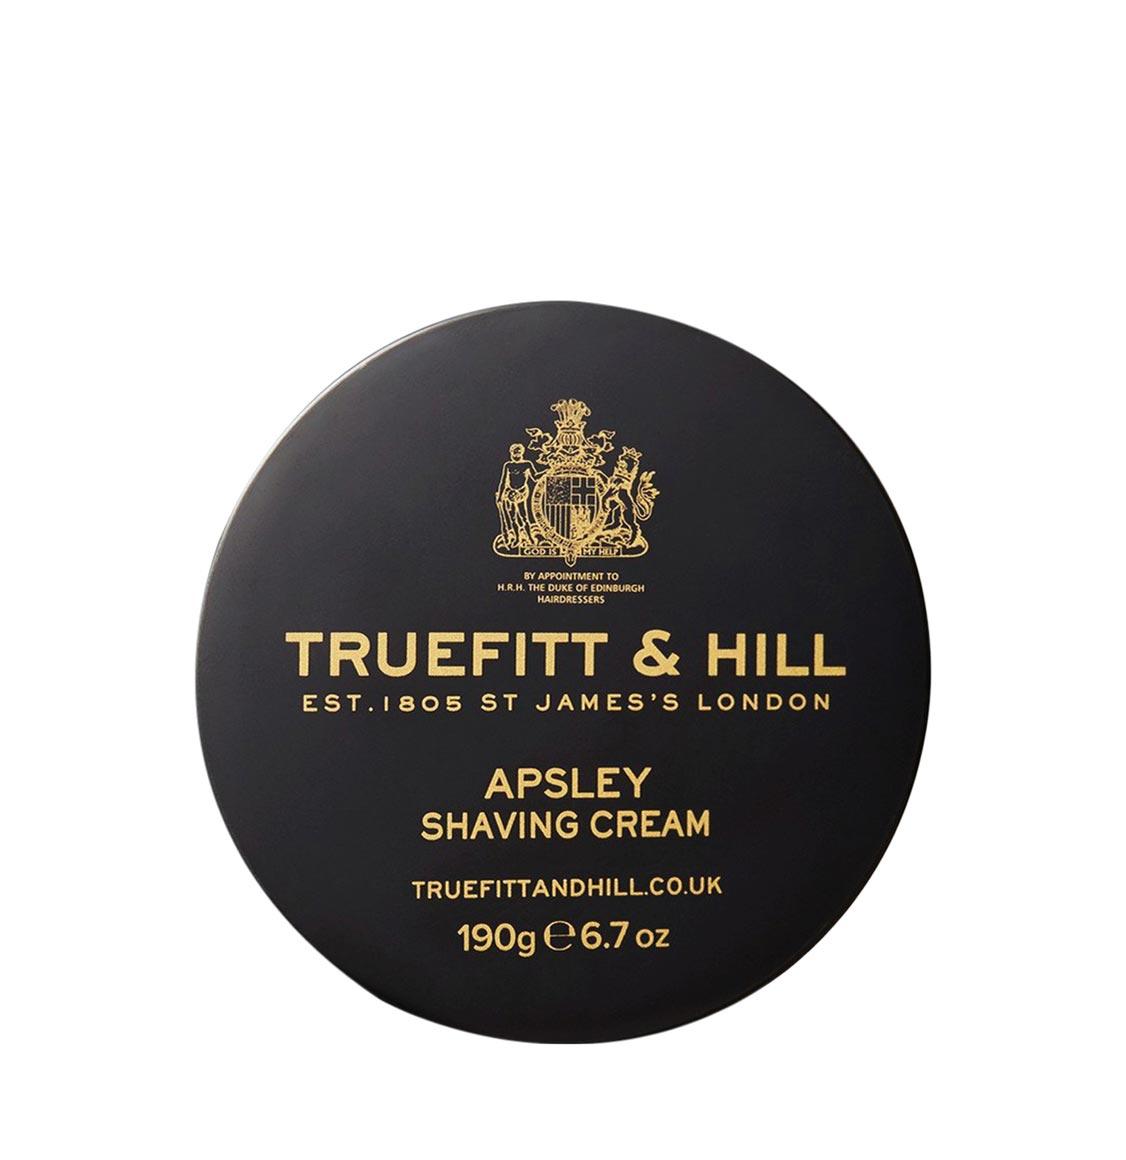 Truefitt And Hill Apsley Shaving Cream Bowl 190g